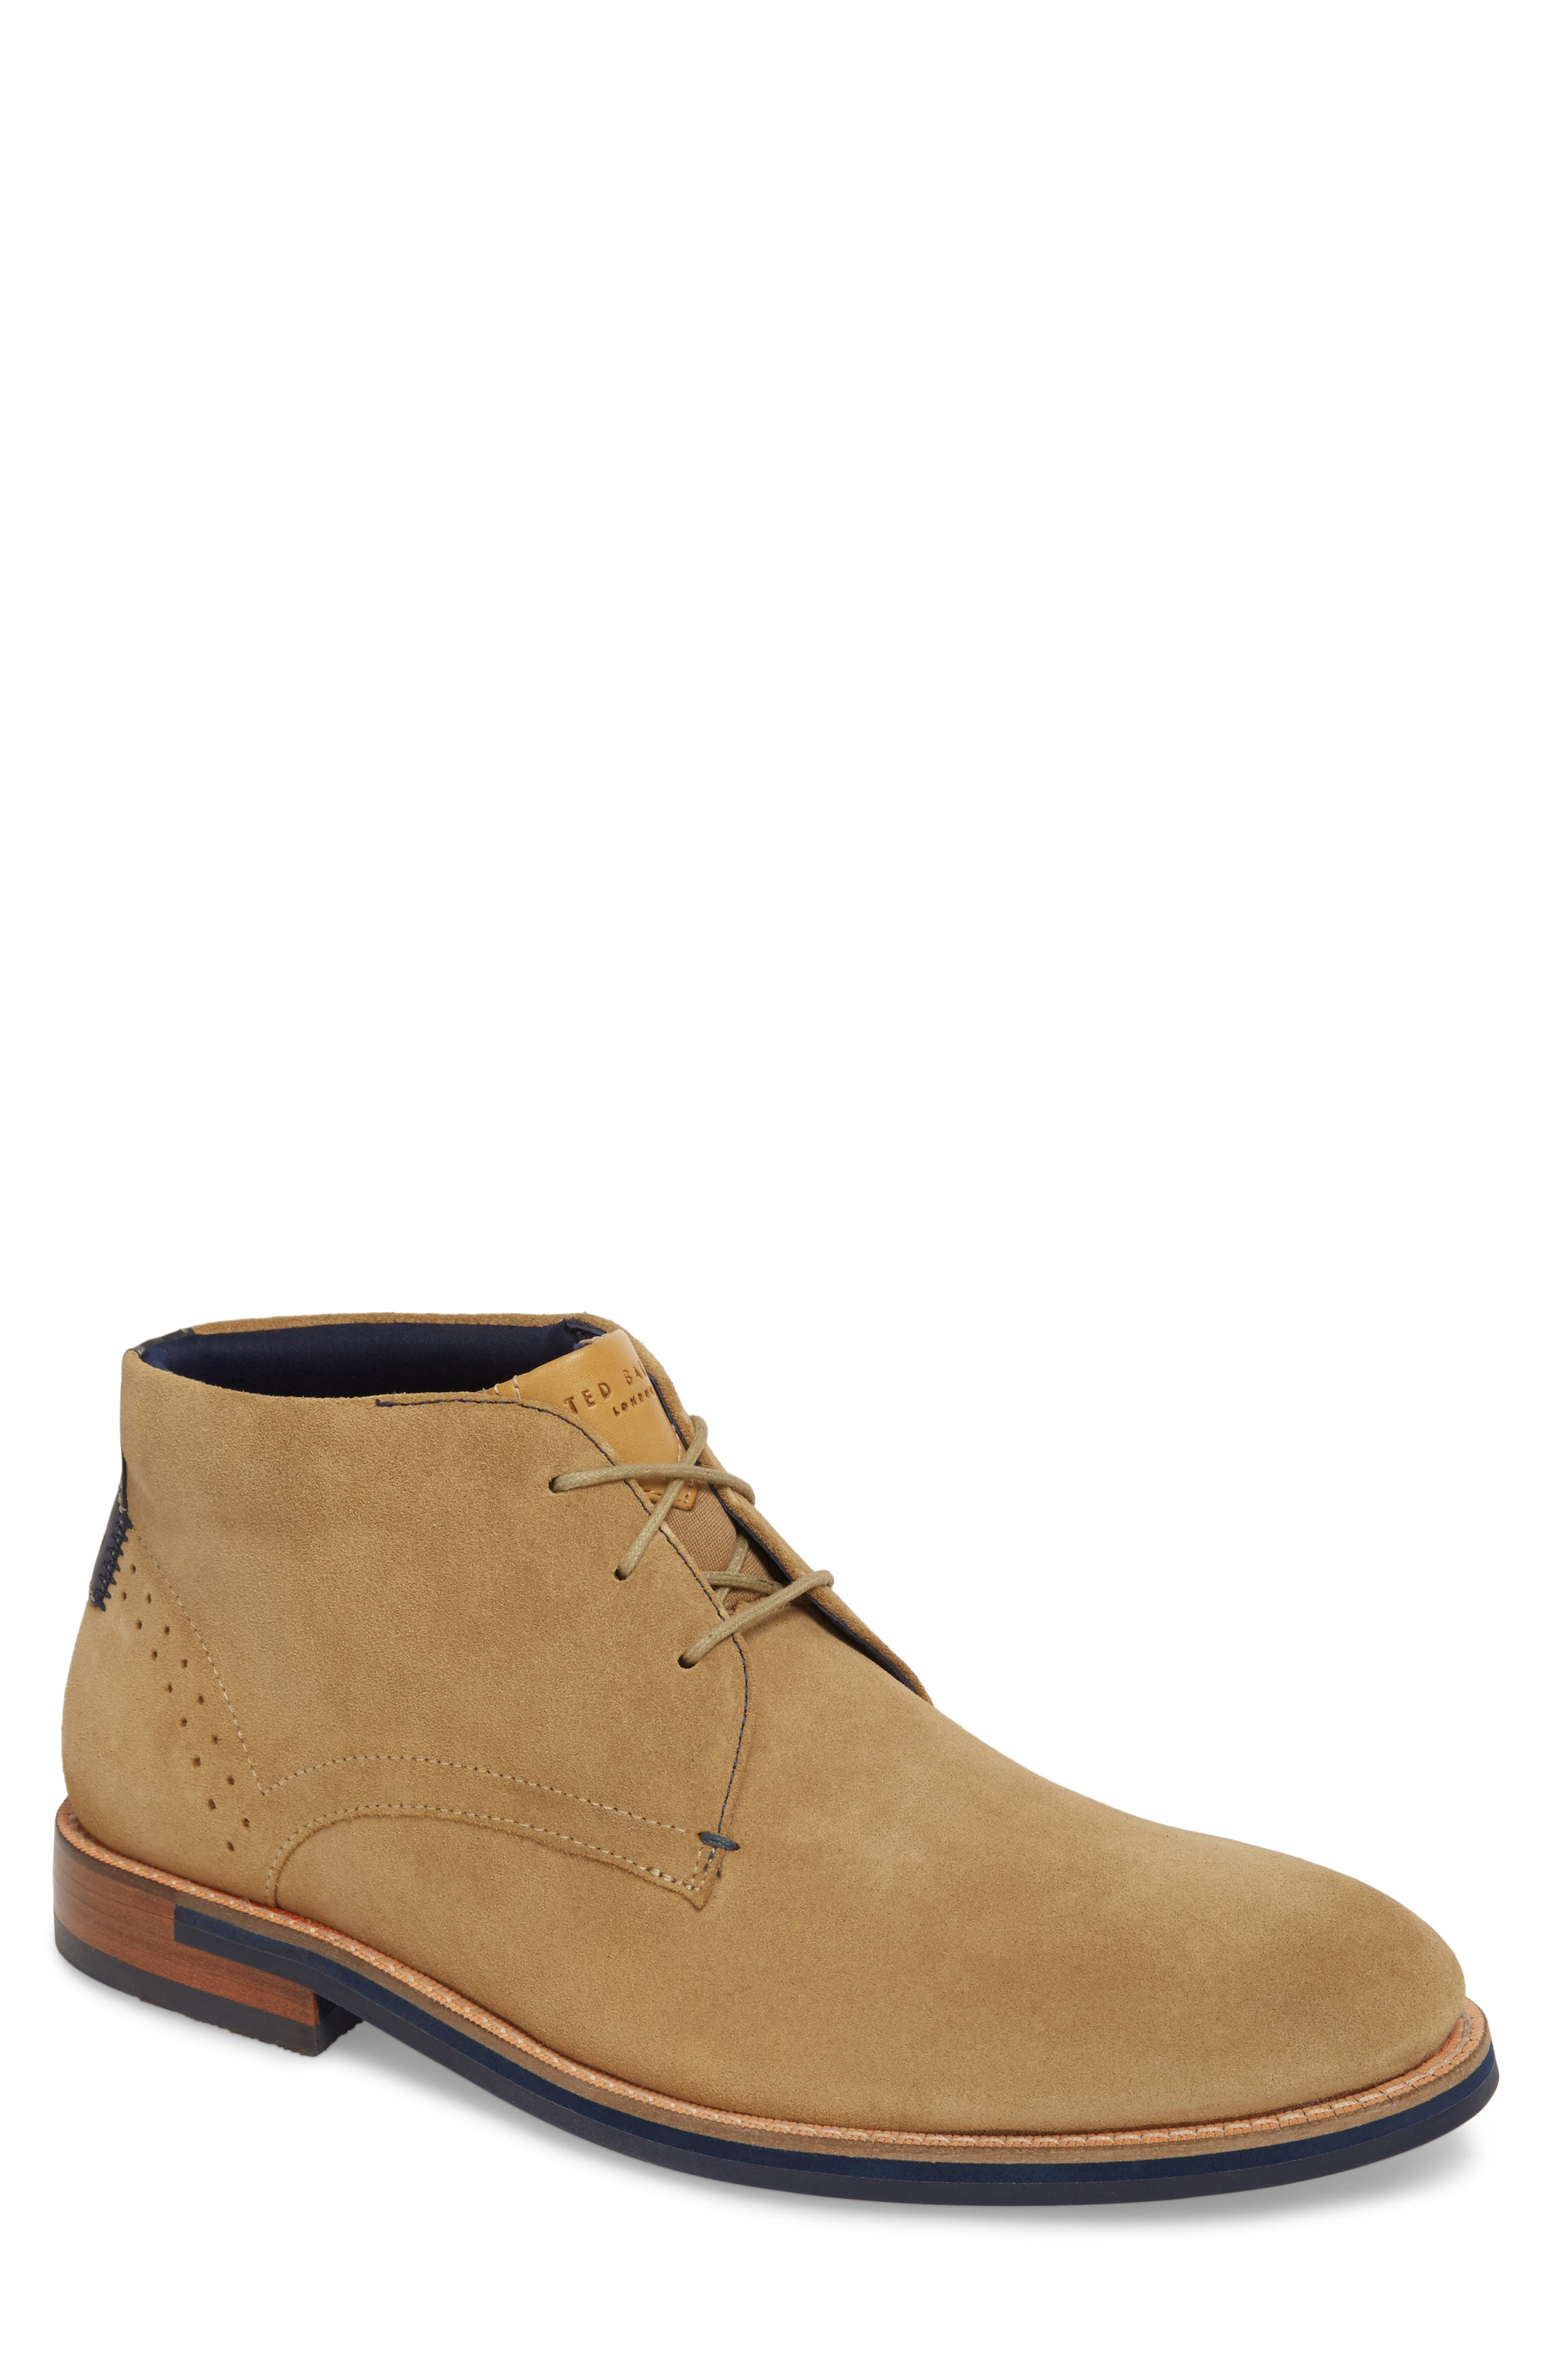 Daiinos Chukka Boot,                         Main,                         color, Sand Suede